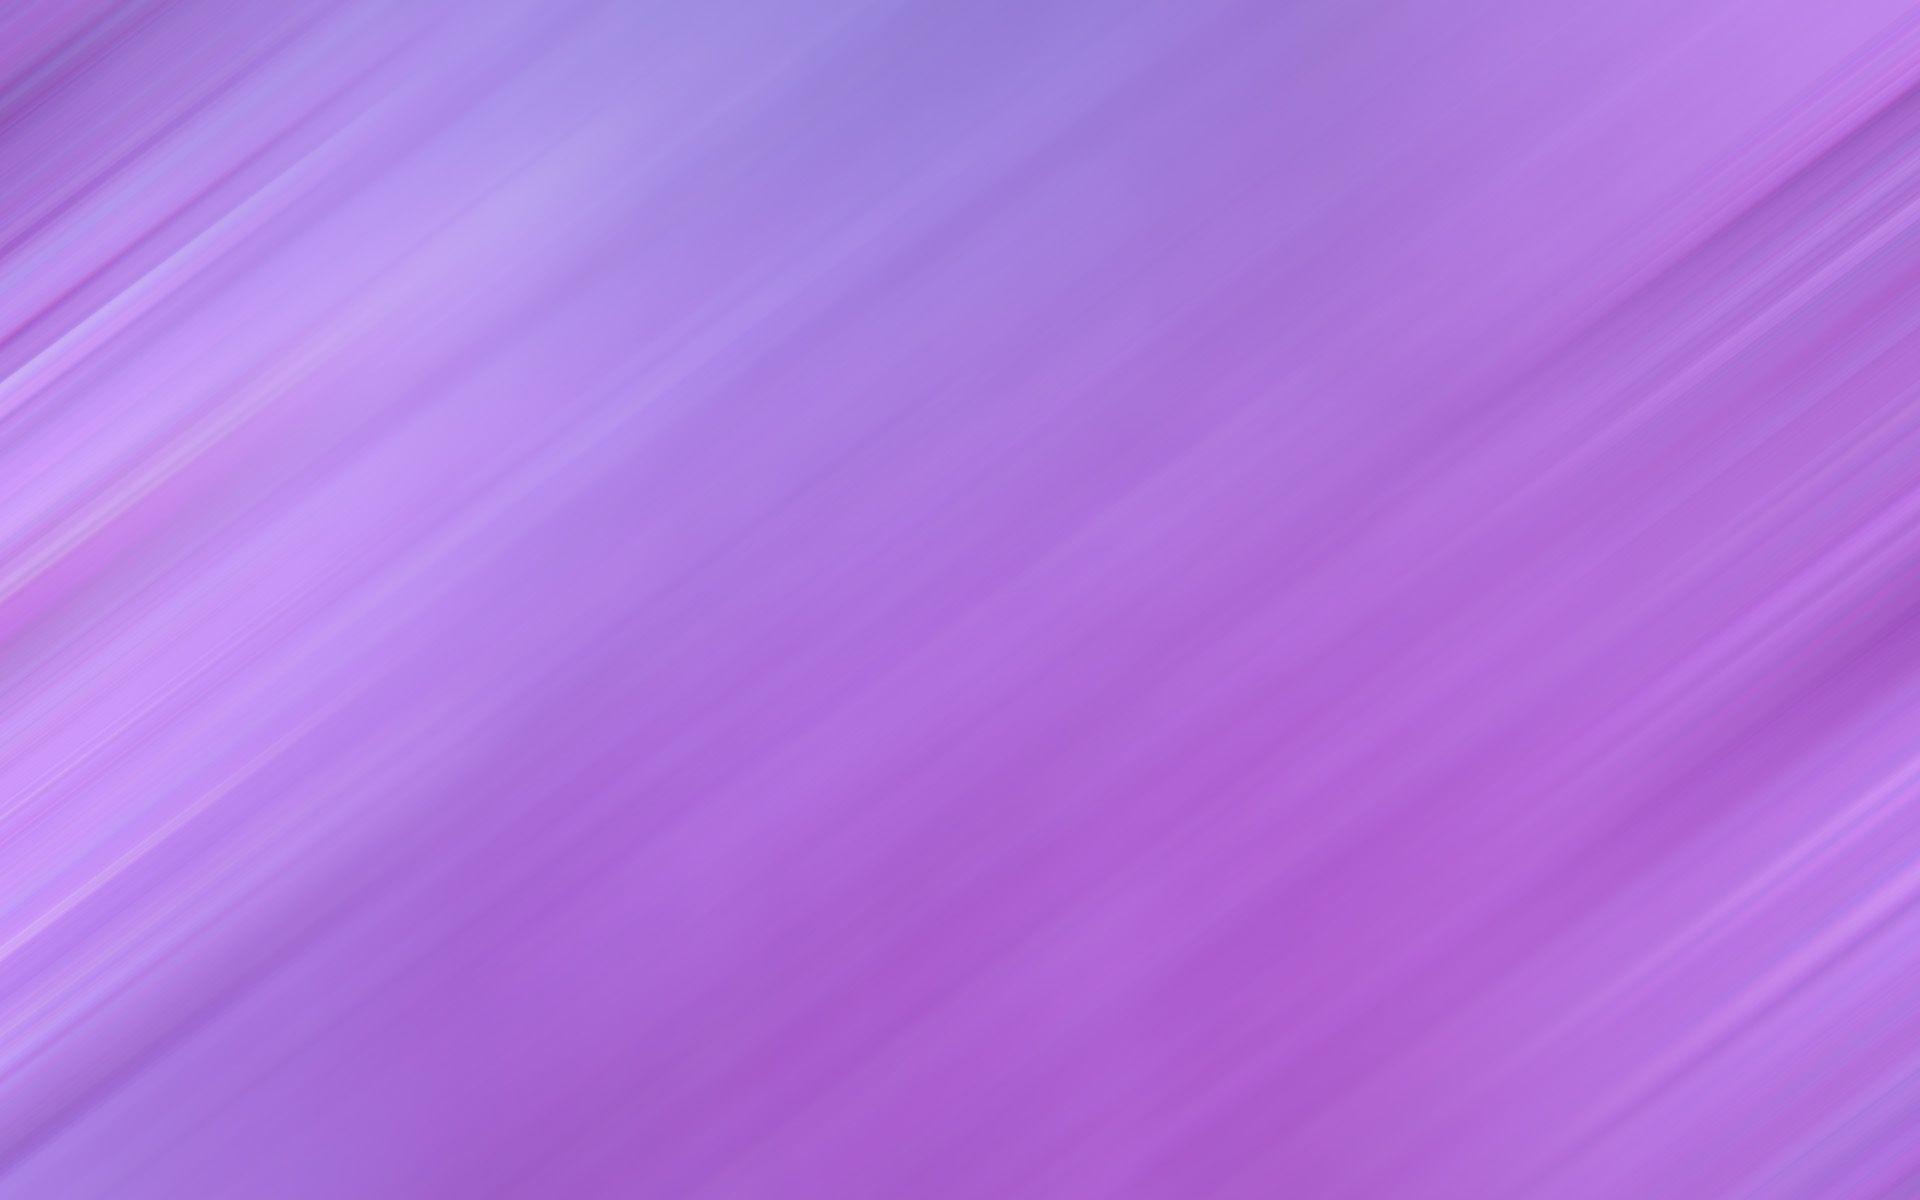 Light Purple Background Hd: Simple Purple Wallpapers